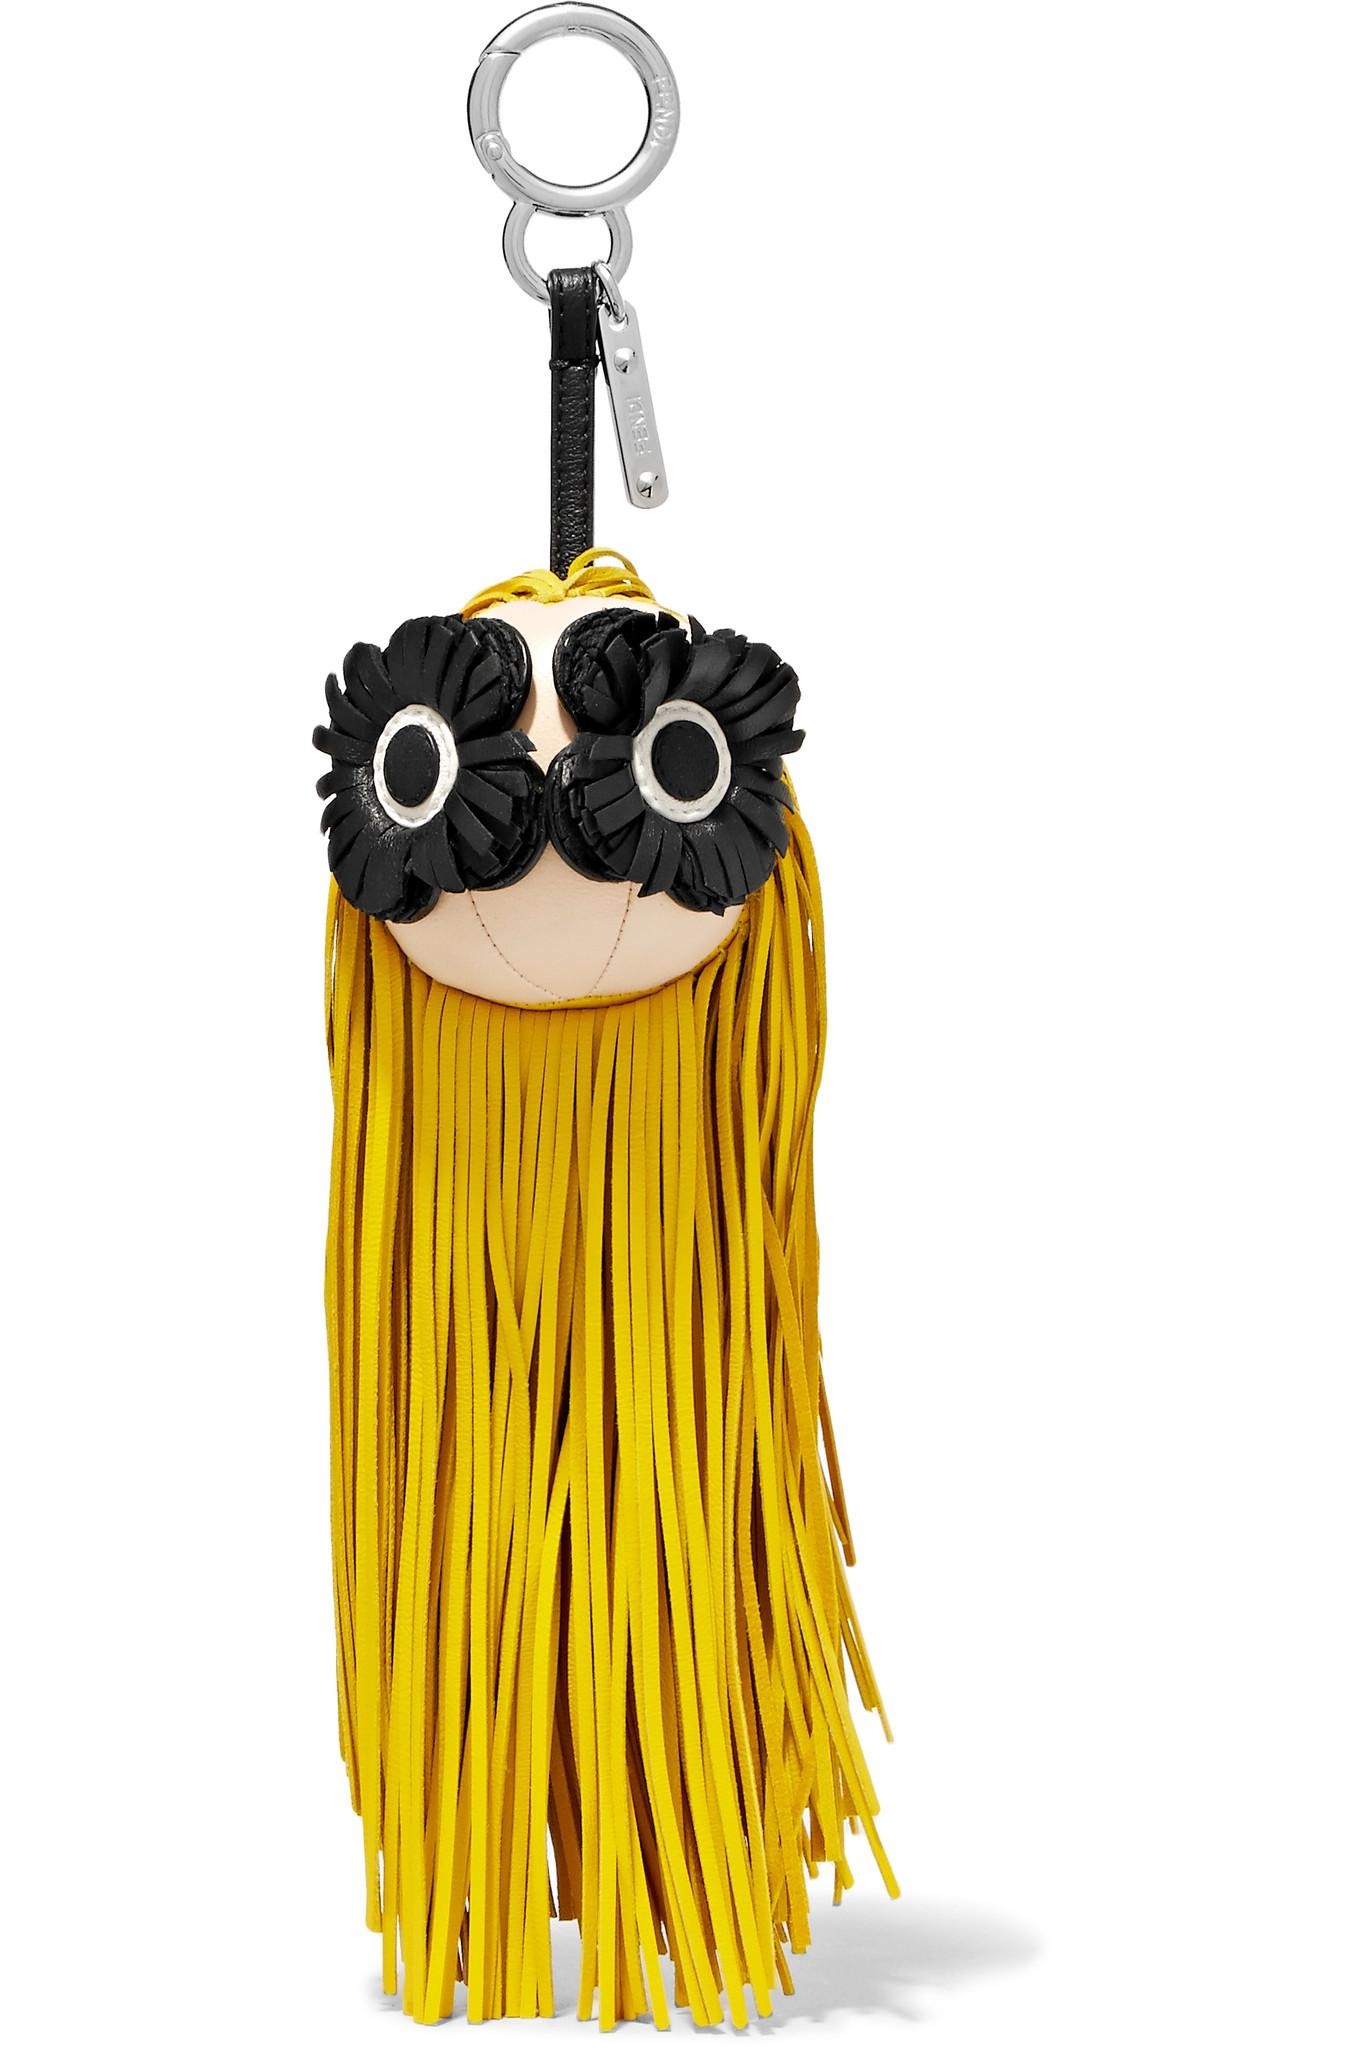 Fendi Fringed Leather Bag Charm - Yellow gog6HSH4b